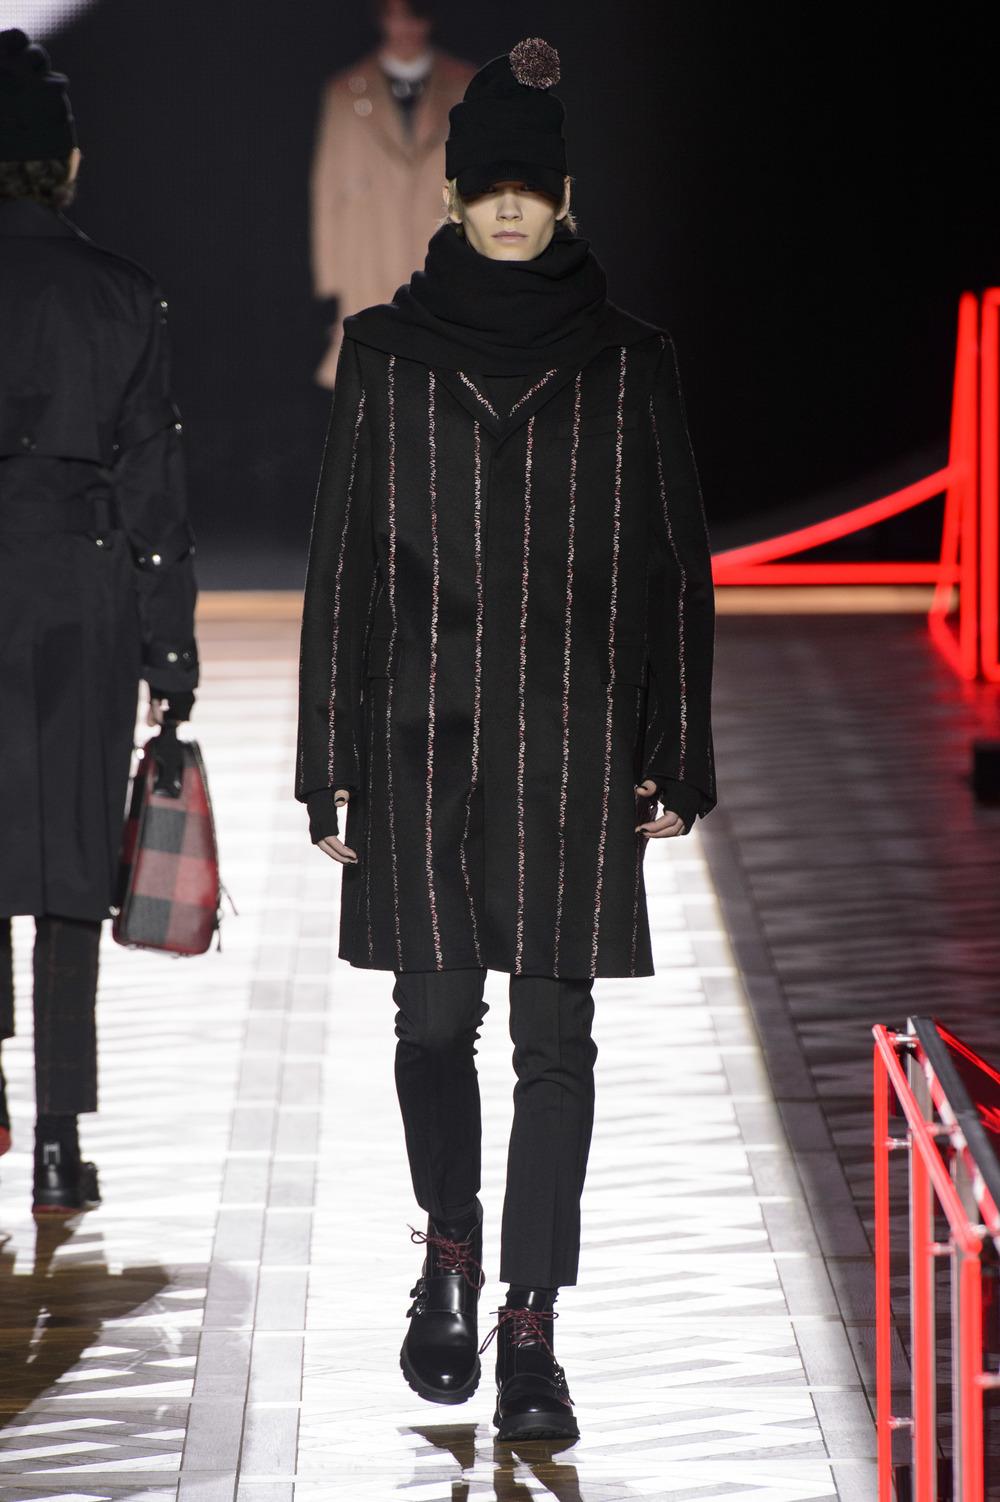 Dior_Homme_Hiver2016-17_look_29.JPG